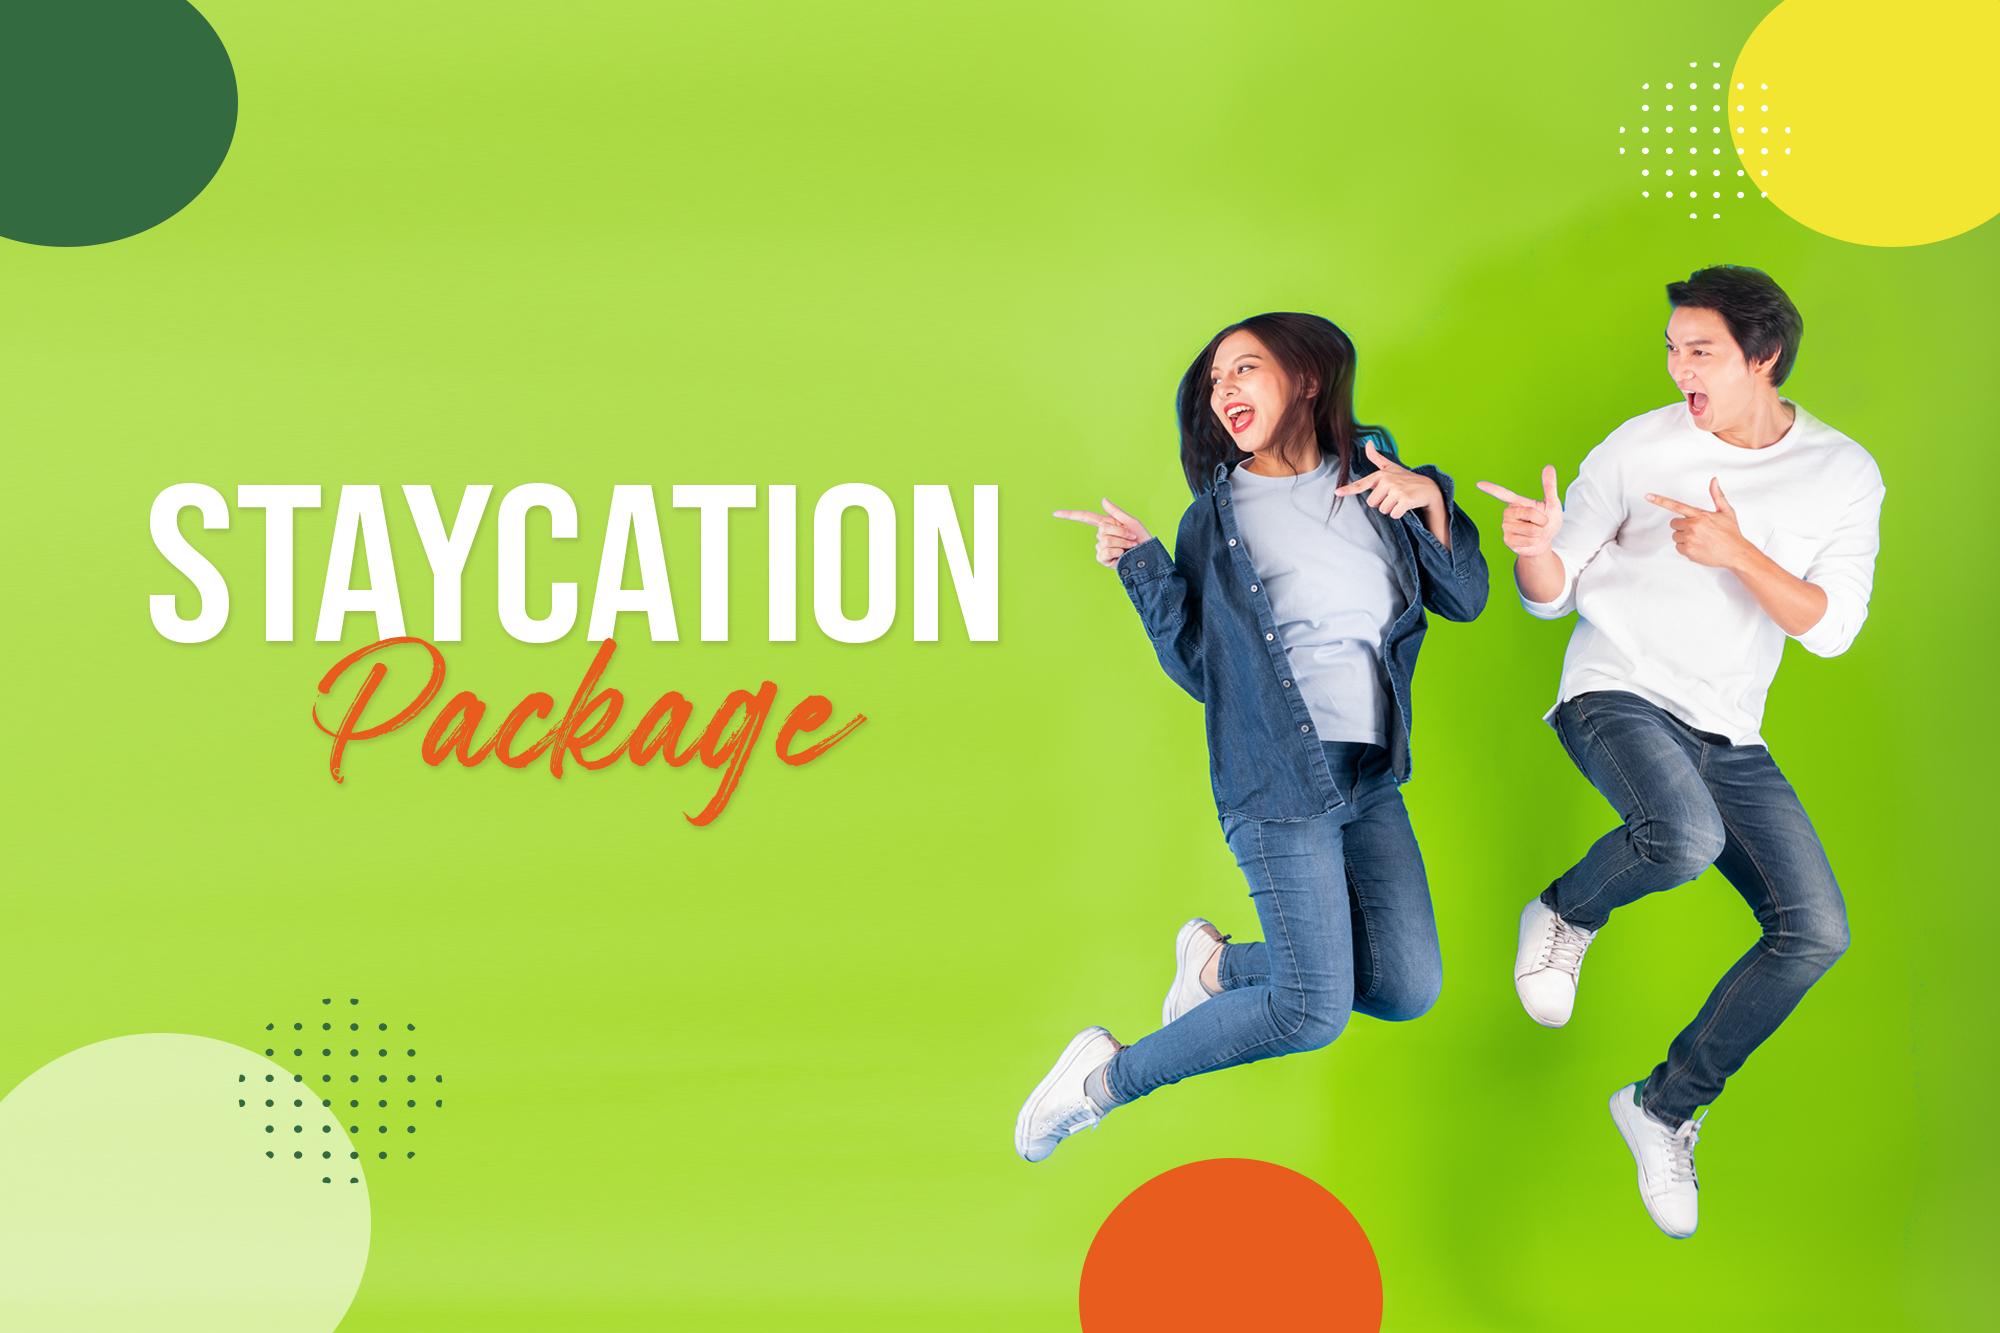 Staycation Sale Diperpanjang!